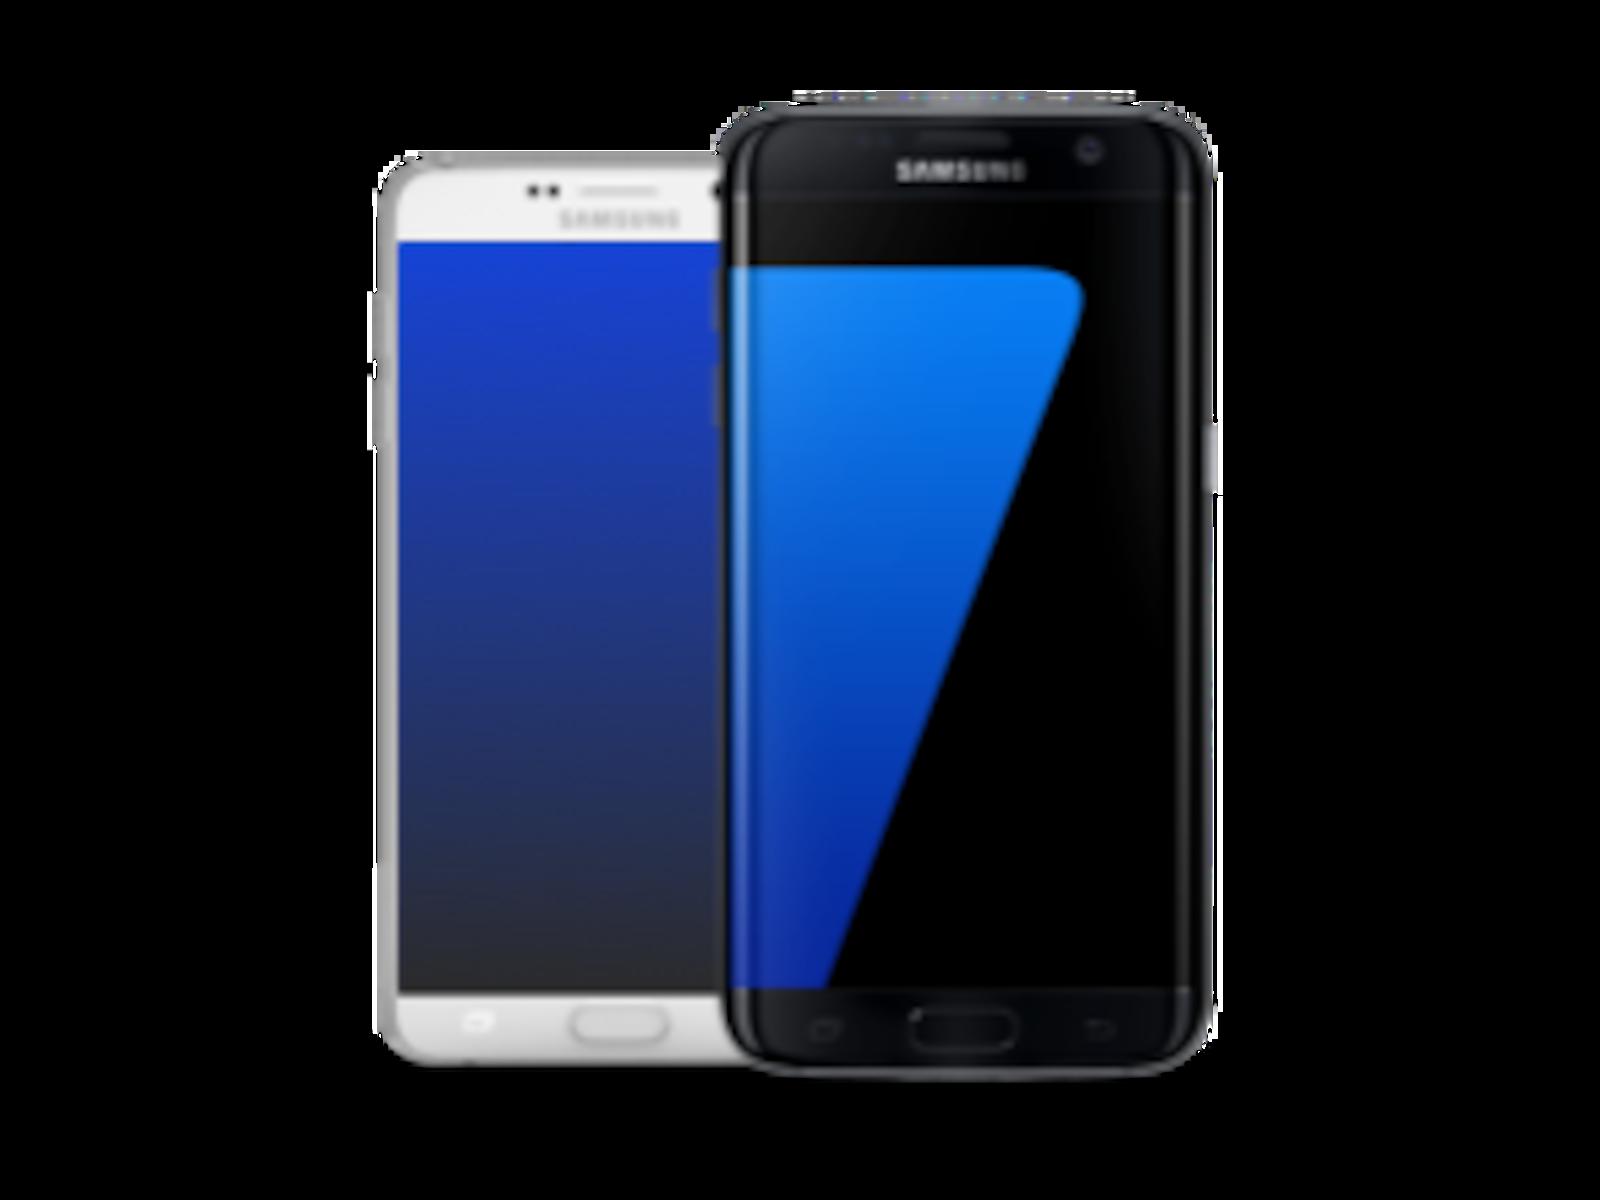 Samsung Galaxy Note5, S5, S6, S6 edge, S6 edge+, S7, S7 edge